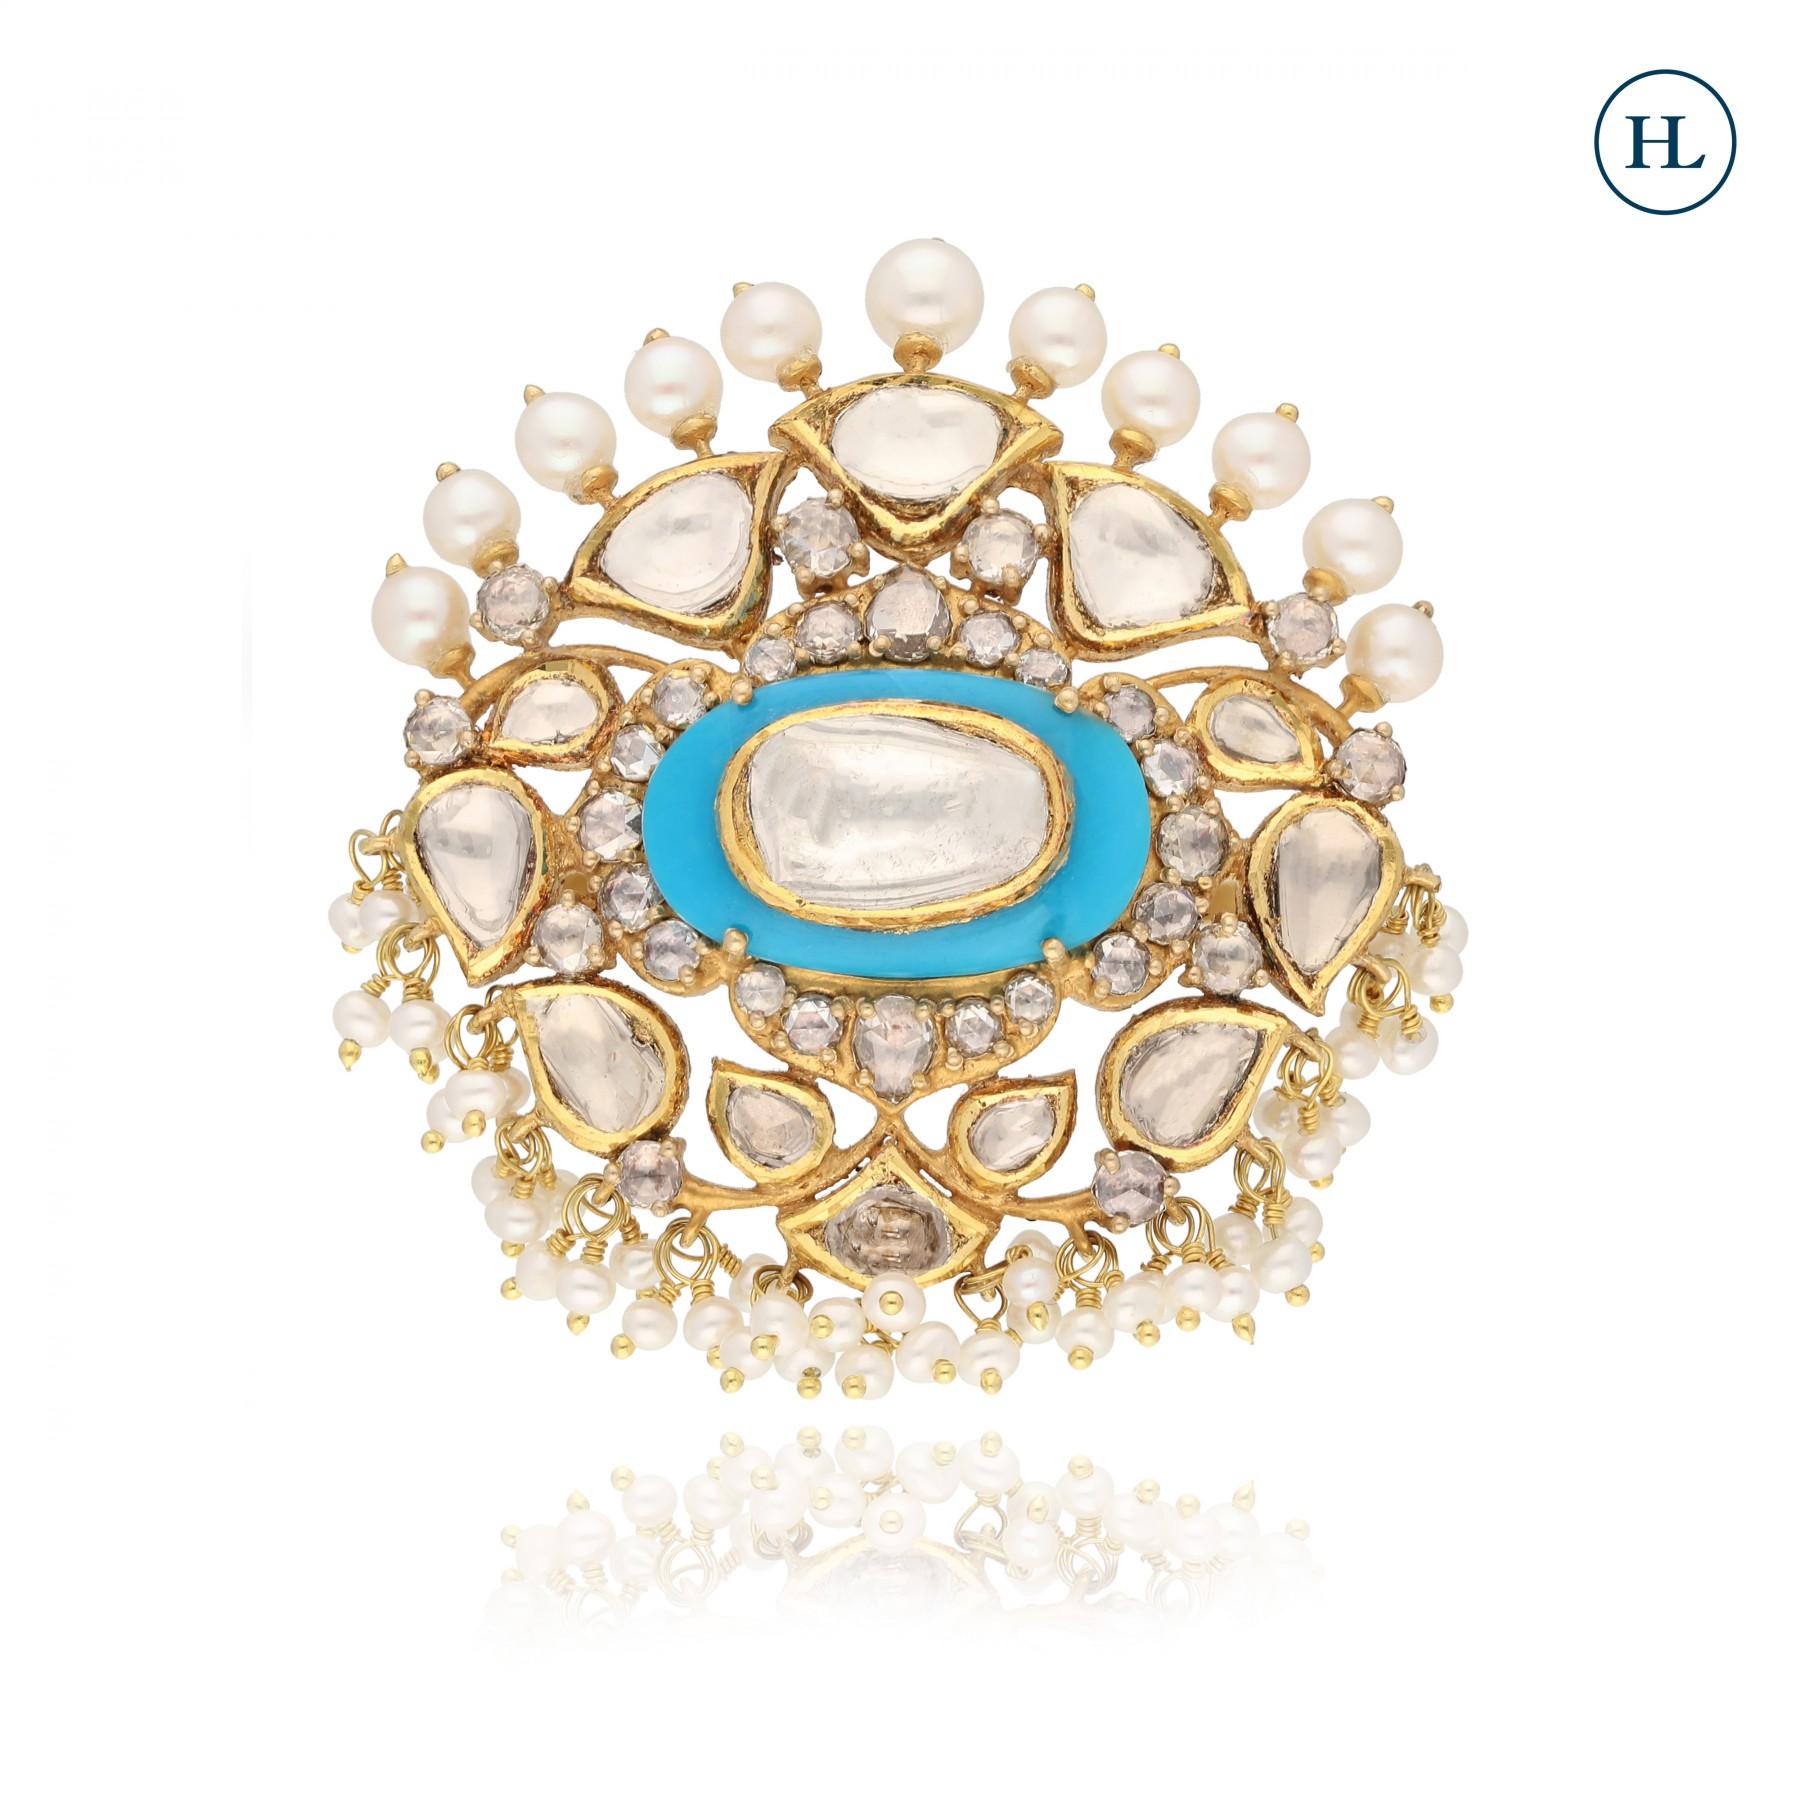 Antique-Styled Polki & Turquoise Ring